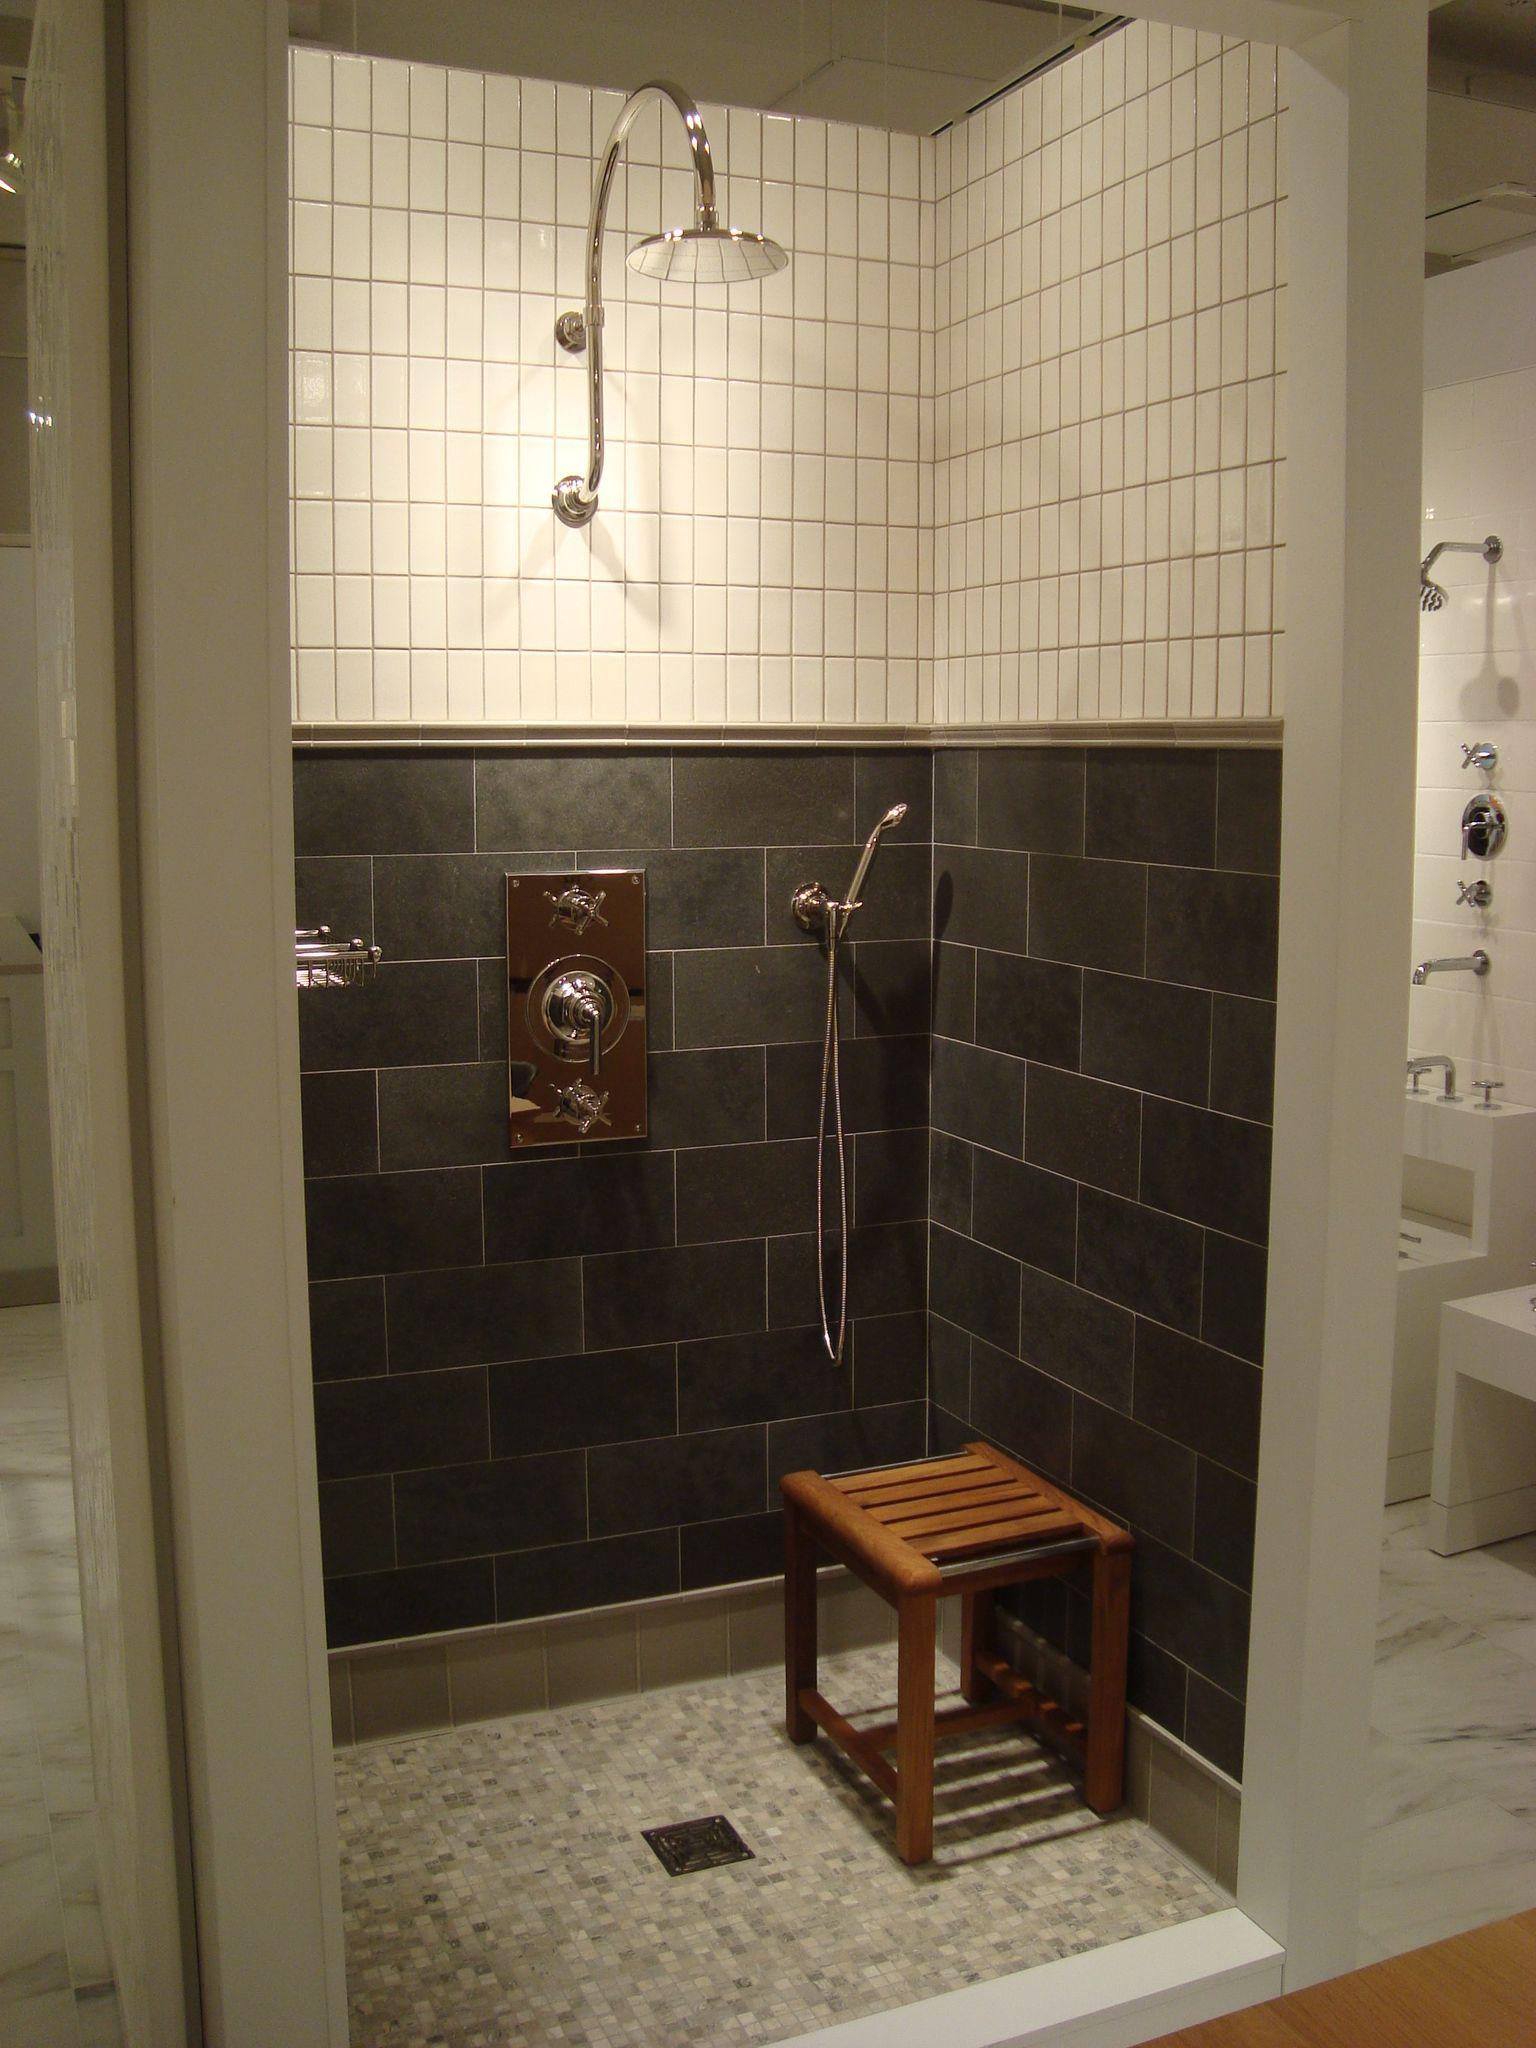 Boston bathroom showroom - Henry Shower Display In The Boston Showroom